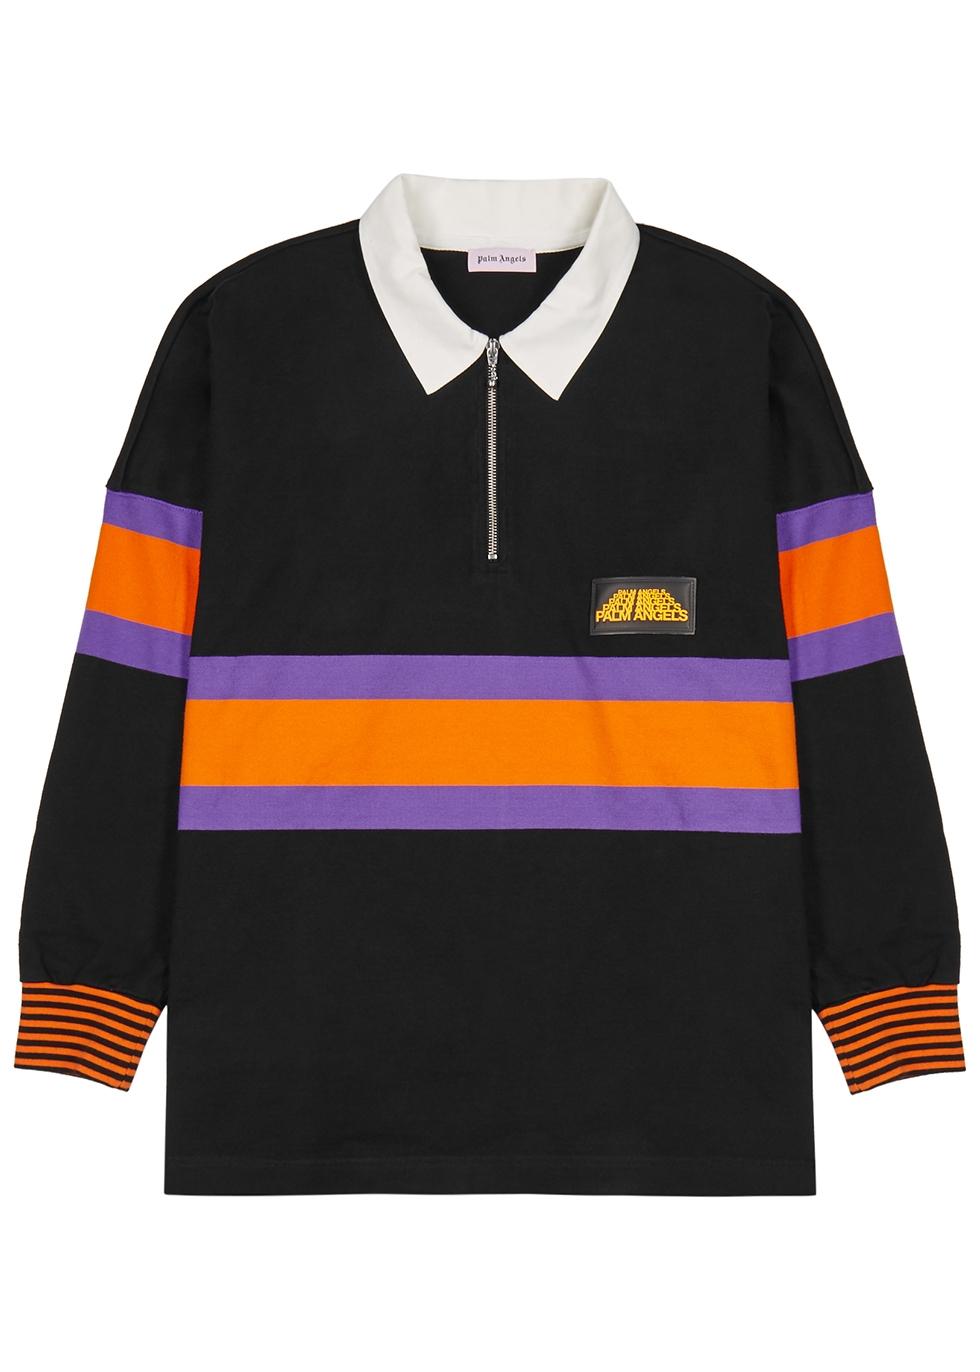 Black striped cotton polo shirt - Palm Angels